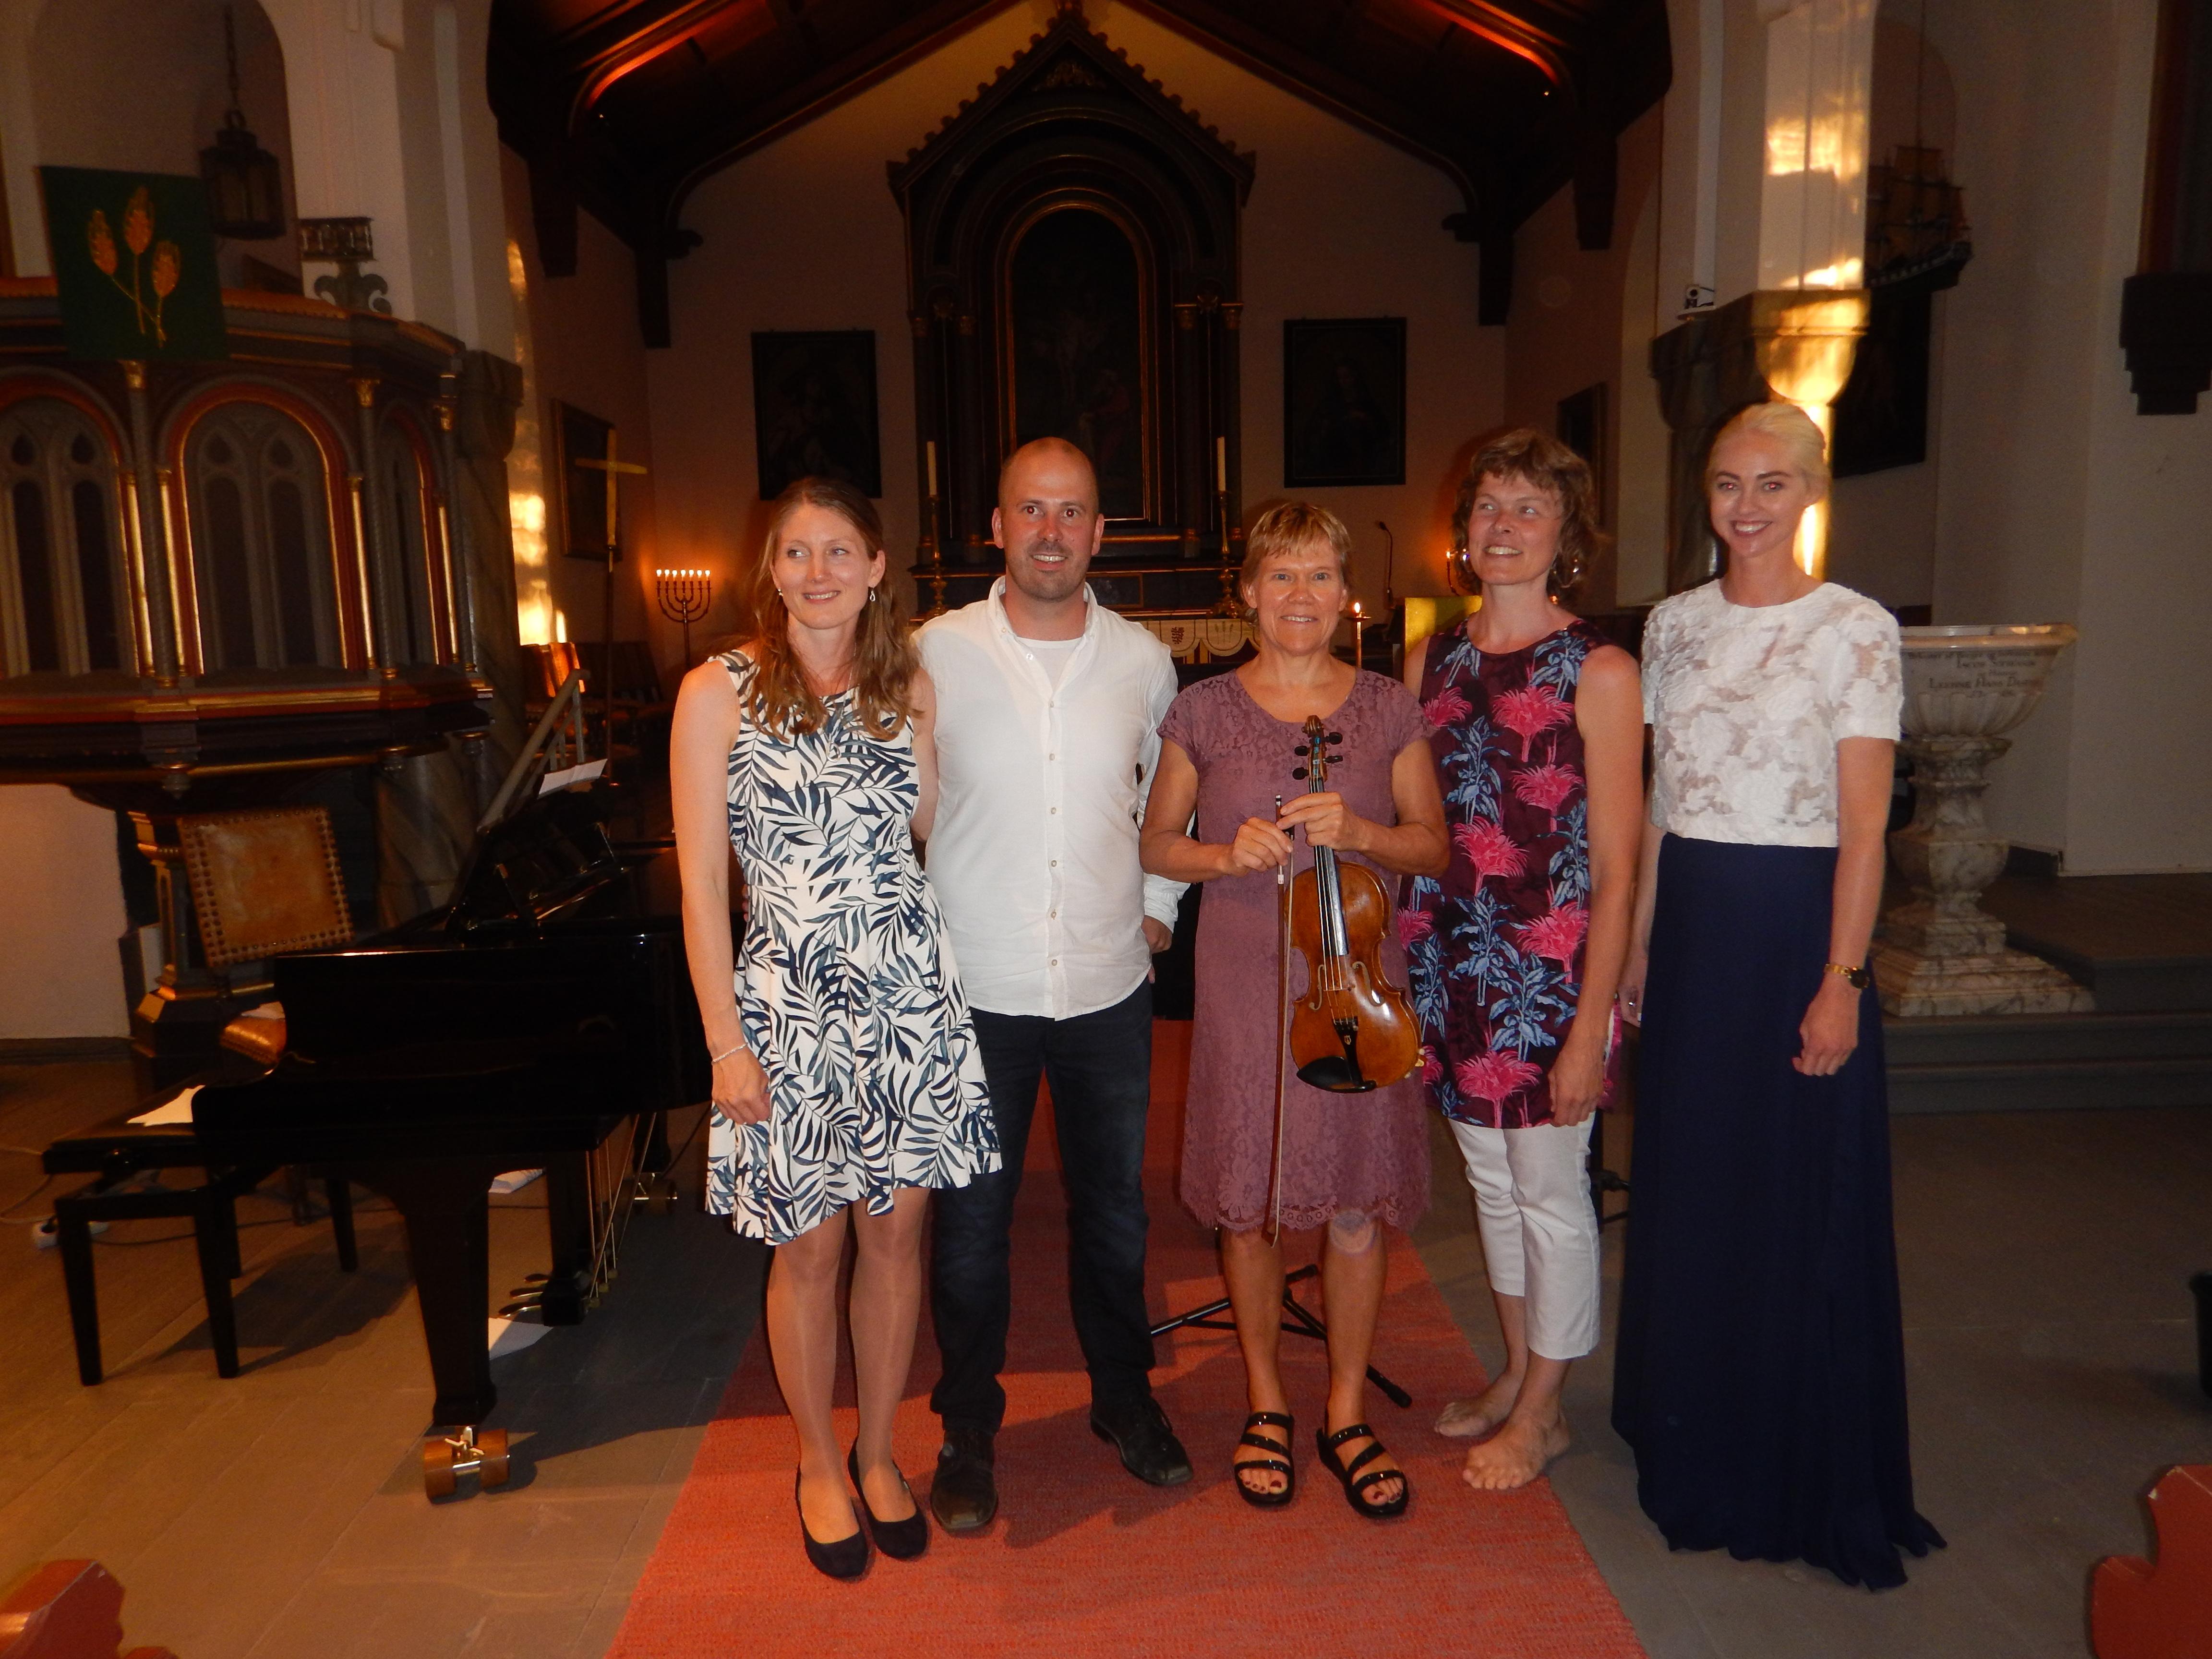 fiolin, sang, fløyte, piano, orgel